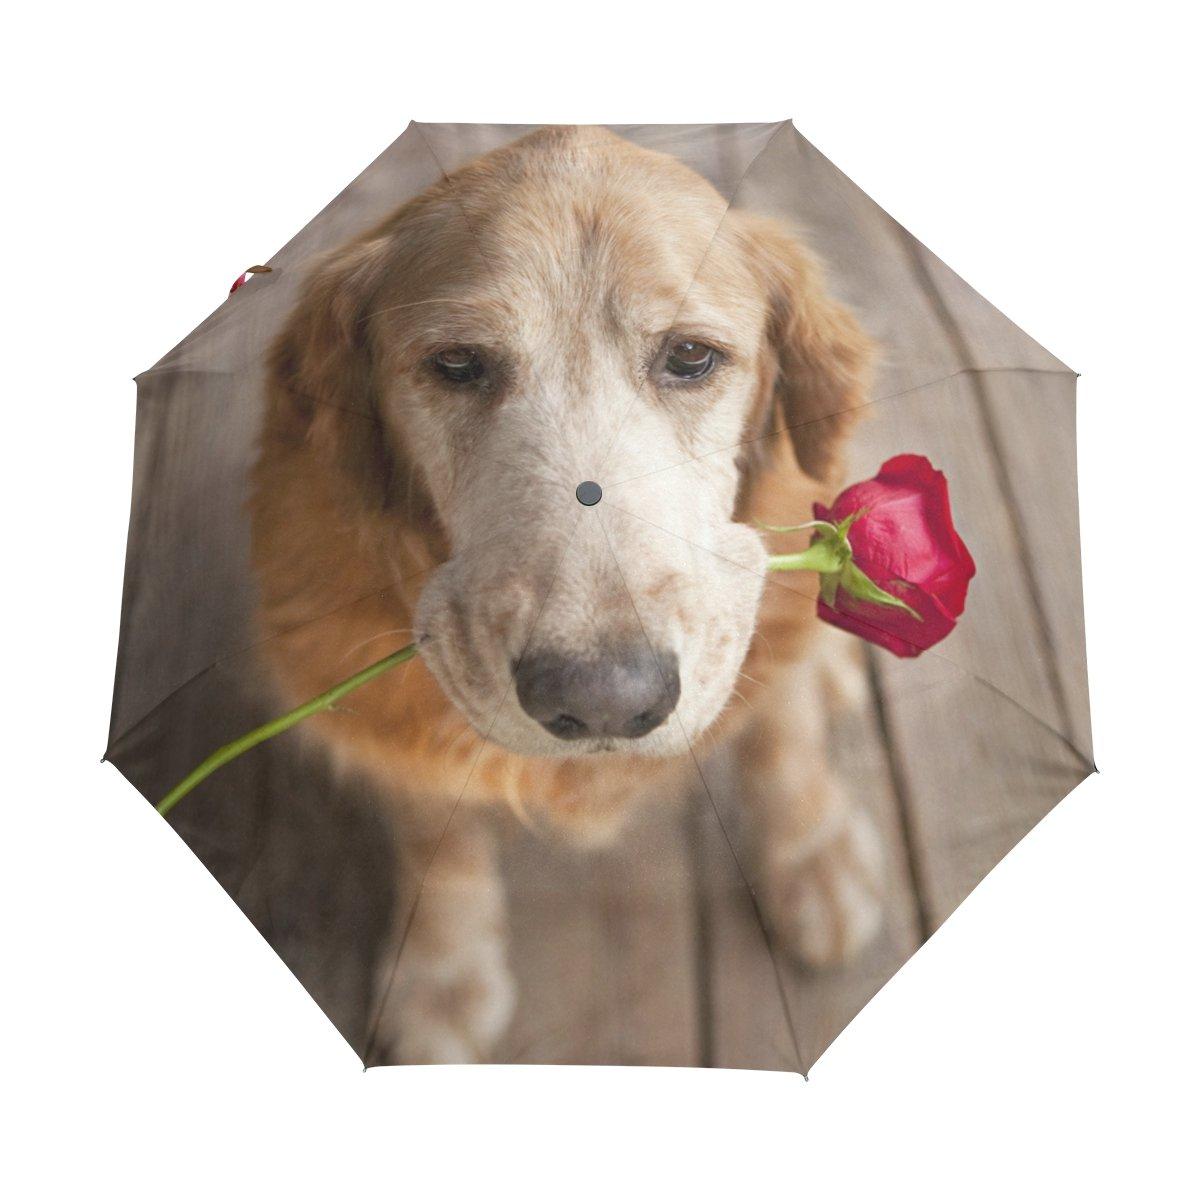 Funny Little Lovely Cute Baby Pig Folding Rain Umbrella Parasol Windproof Travel Sun Umbrella Compact